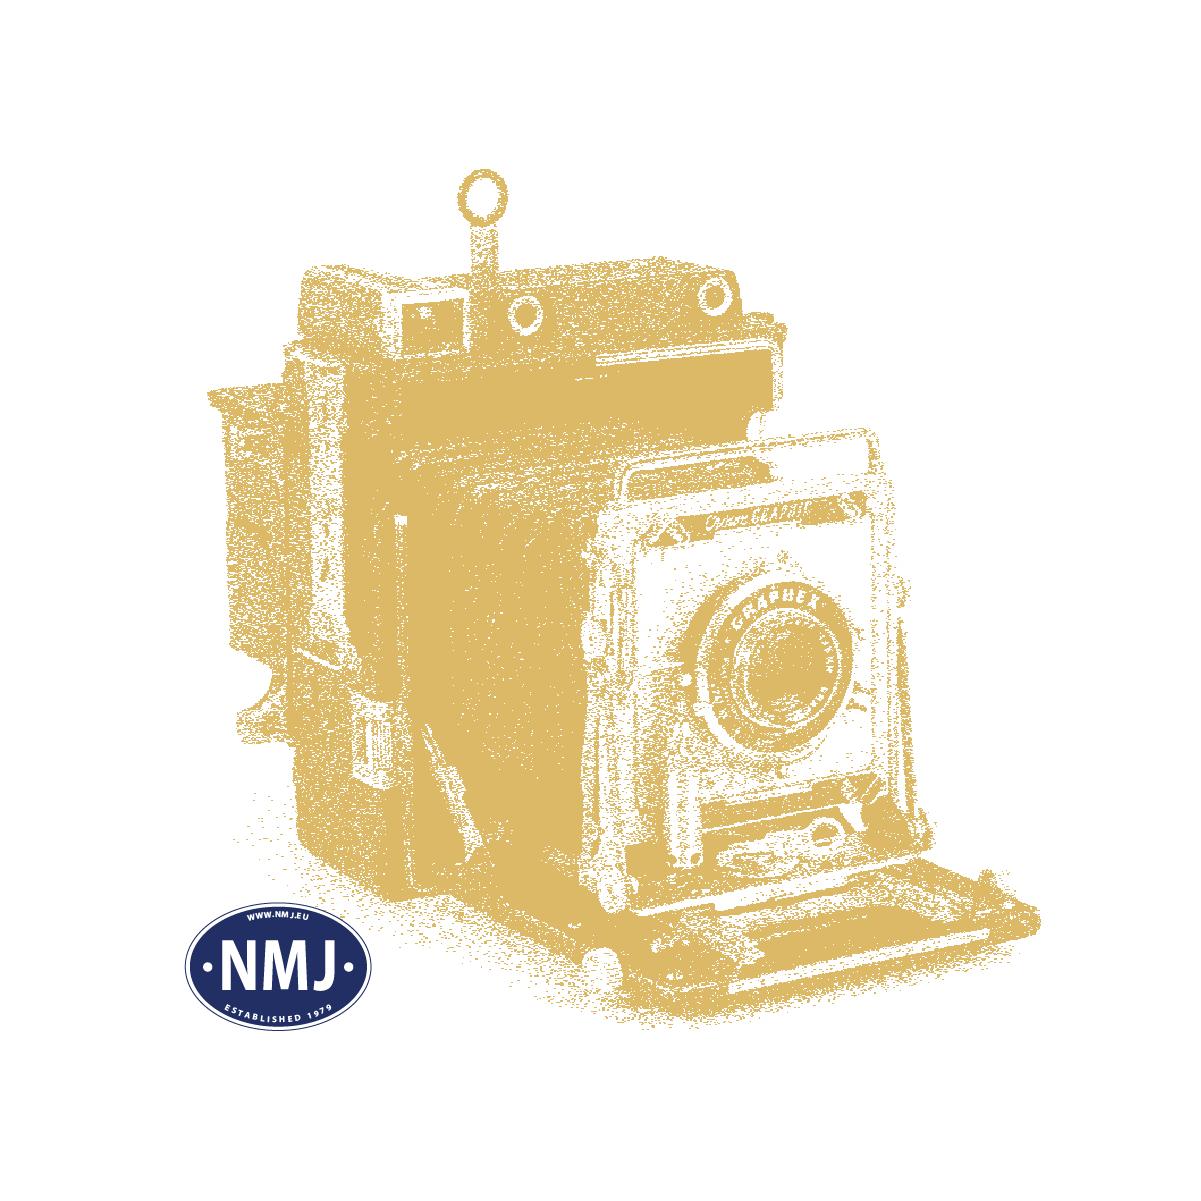 NMJT145006 - NMJ Topline NSB Di3.602 Rot/Schwarz mit GM und OL Logo 1994, DC Analog, Spür 0